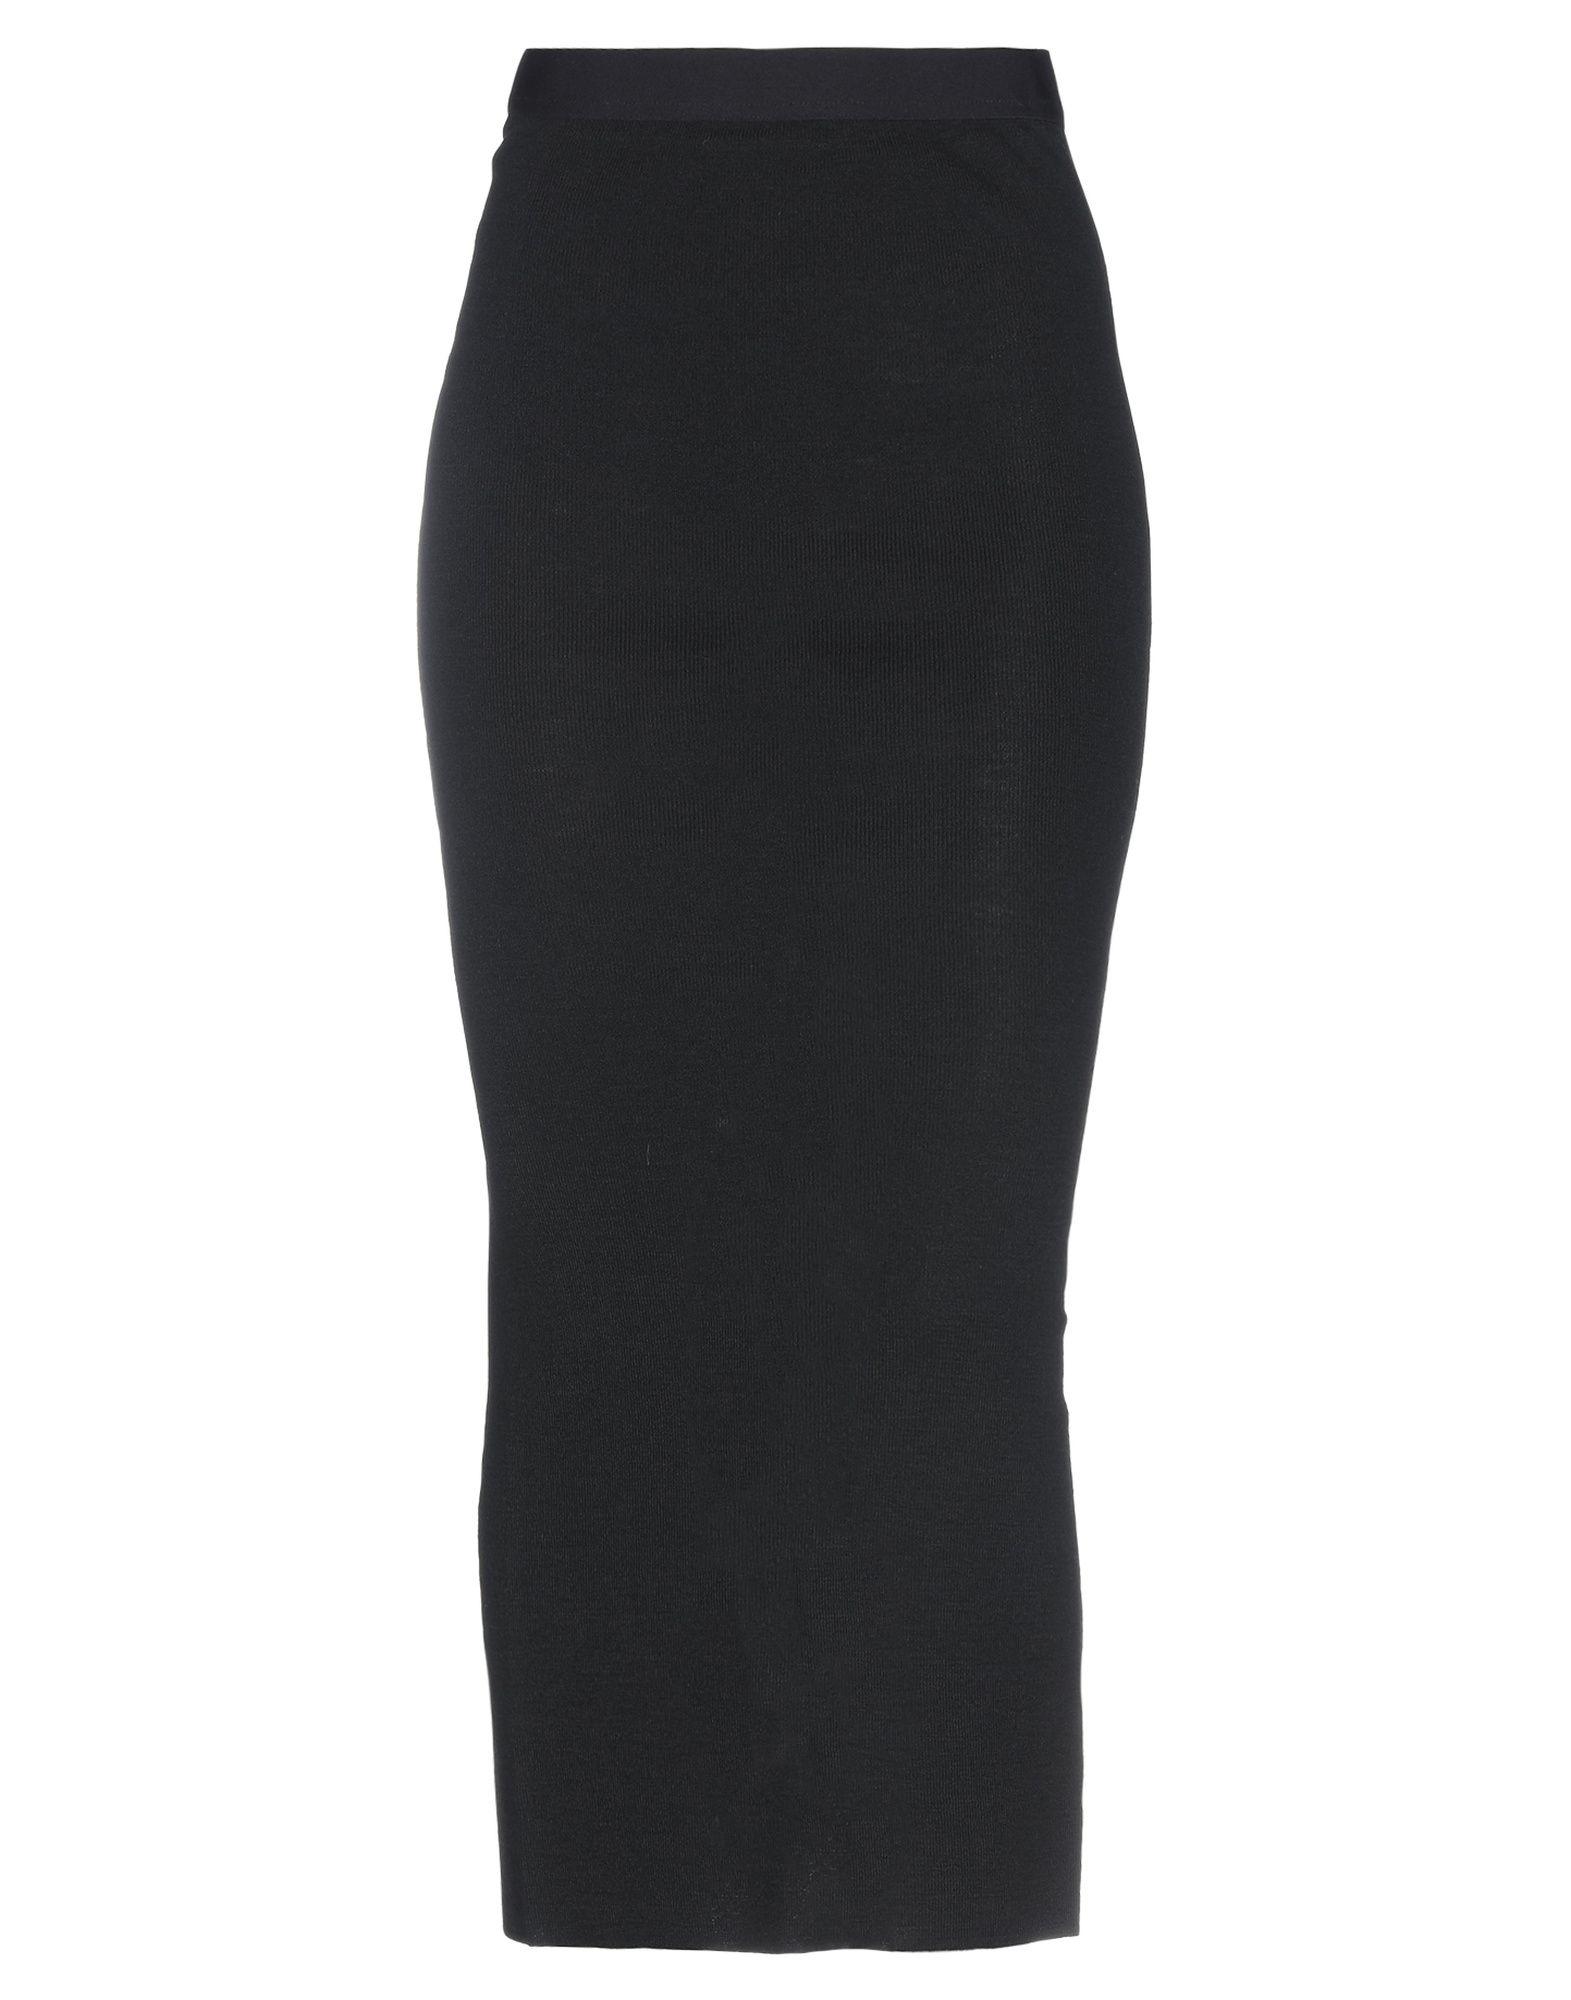 SOUVENIR Длинная юбка souvenir длинная юбка